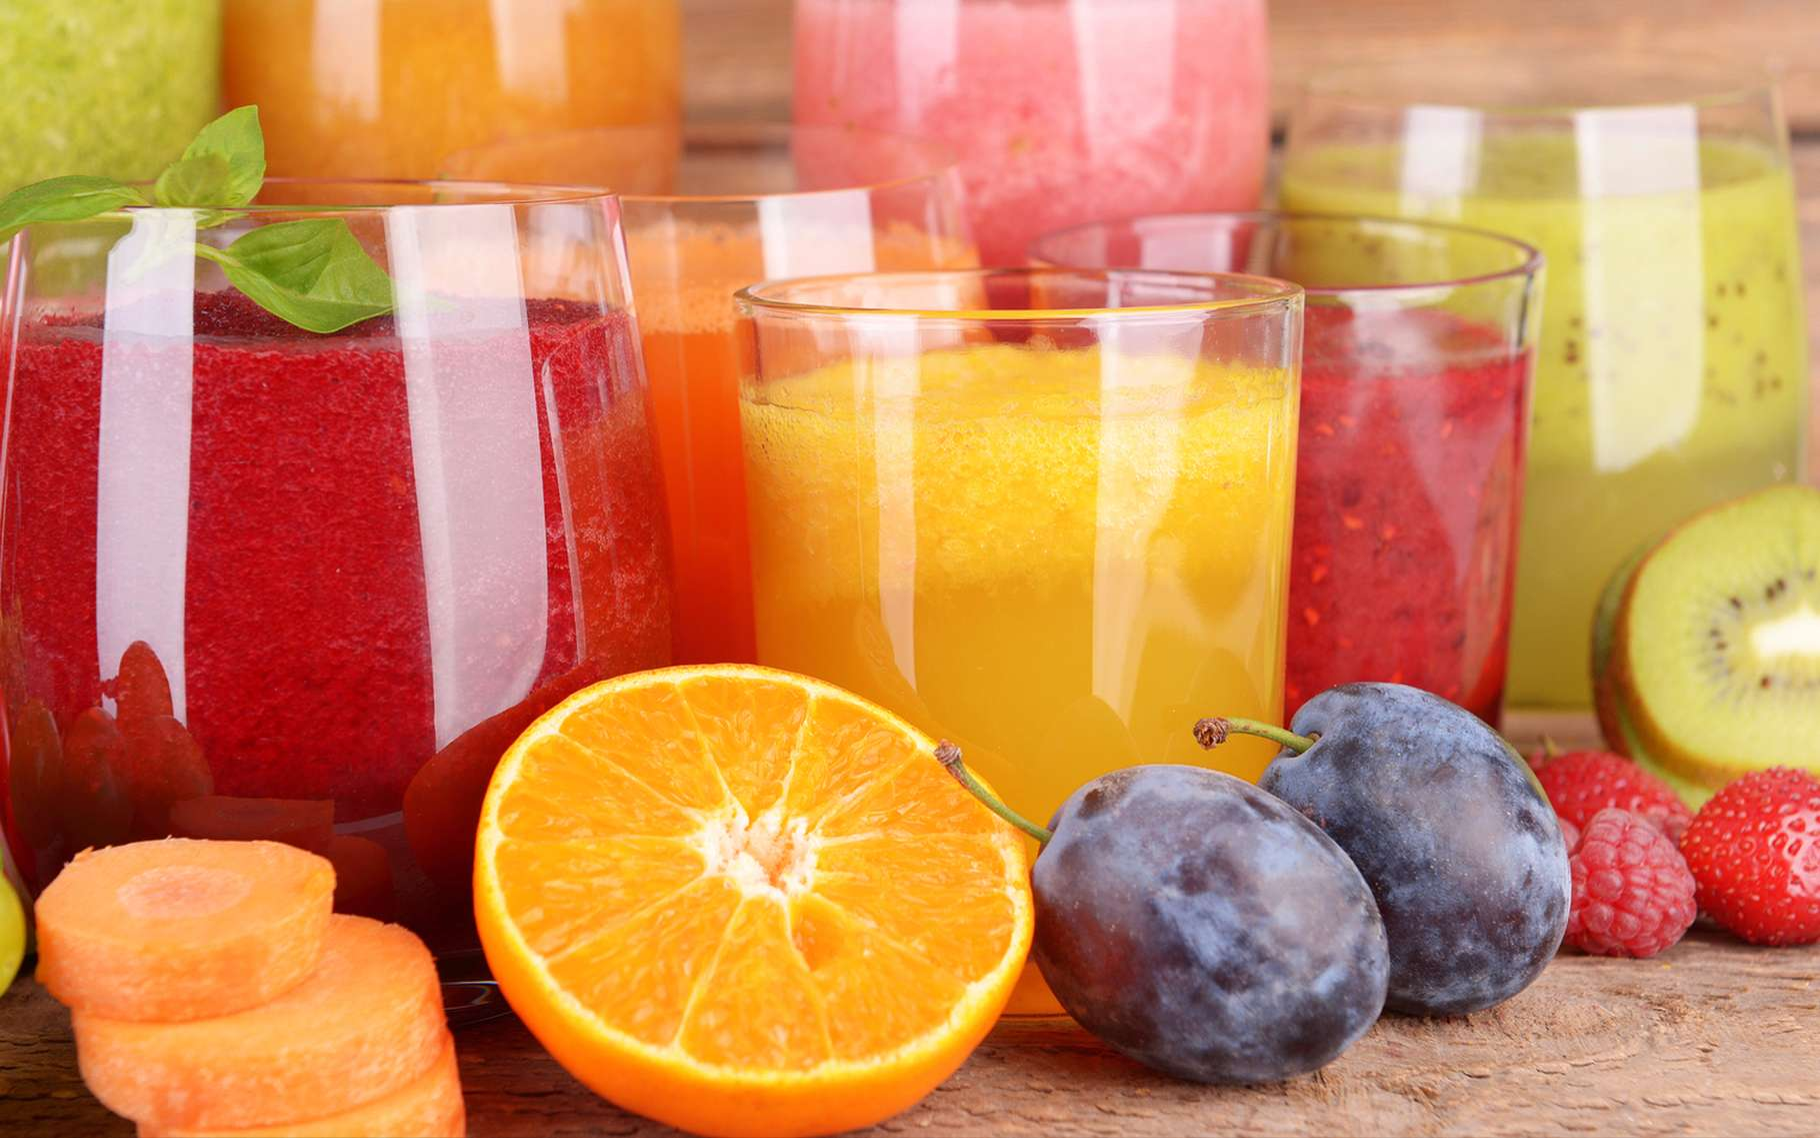 Les jus de fruits contiennent plus de vitamines que les nectars. © Africa Studio, Shutterstock